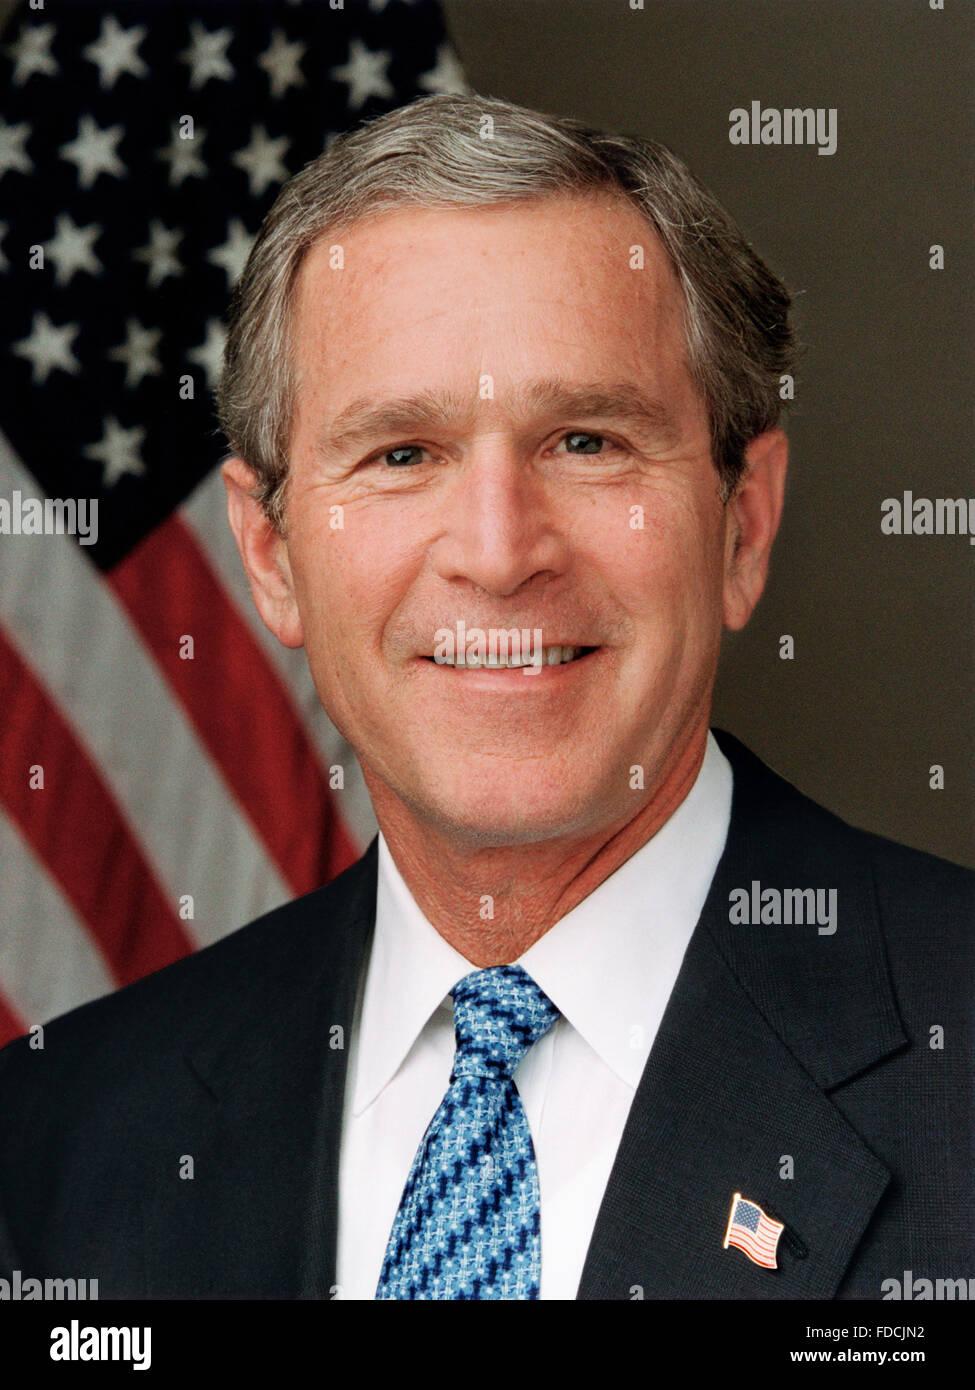 George W Bush. Portrait of US President George W Bush, c.1989 Stock Photo